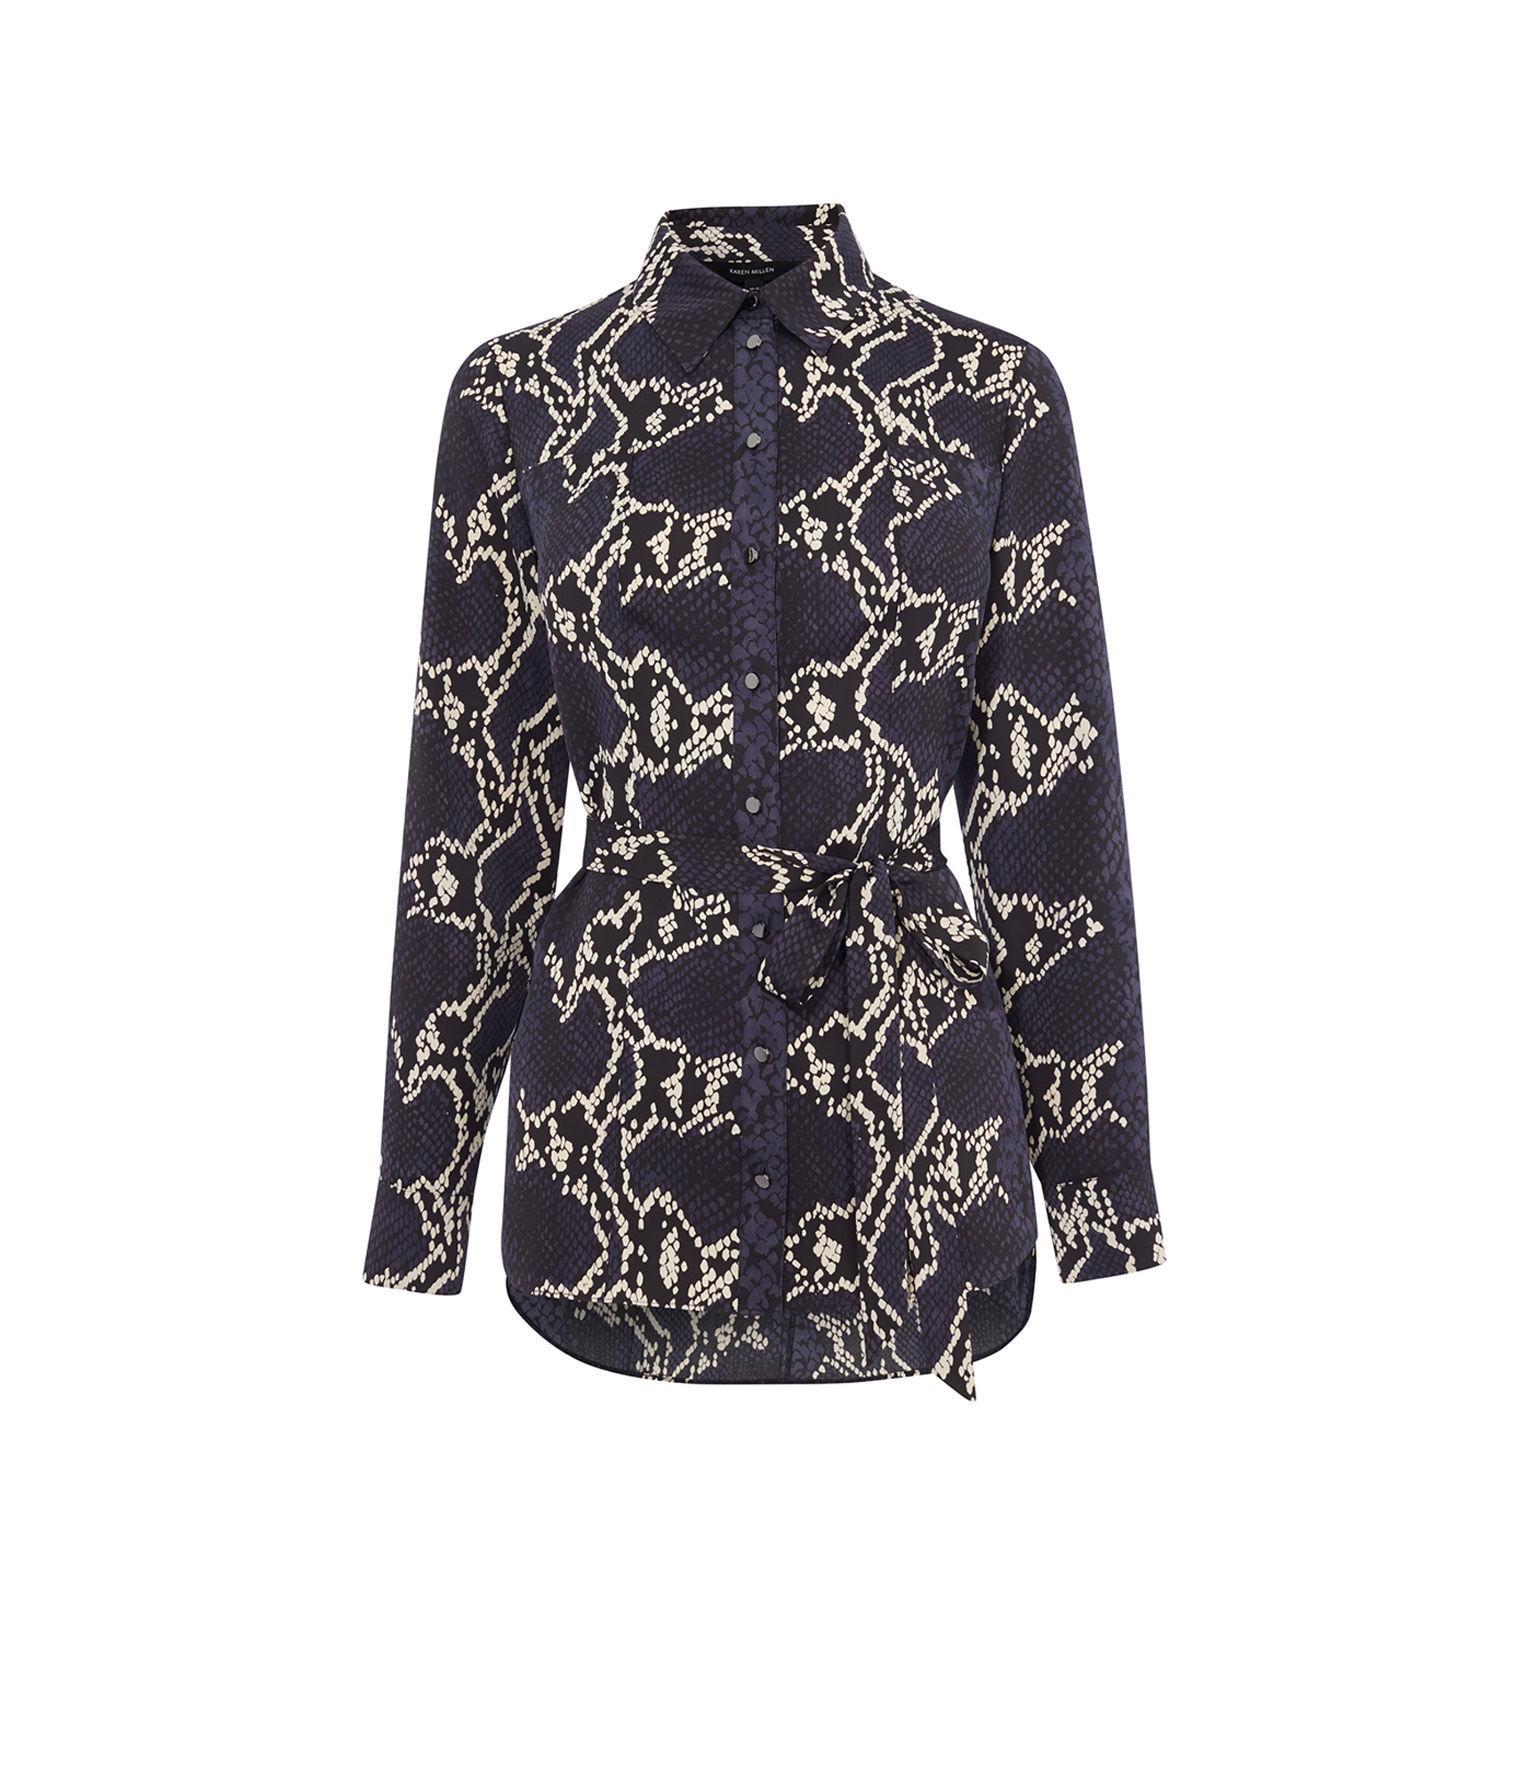 b6fa7cc4e8ecf1 Karen Millen. Women s Snakeskin-print Shirt